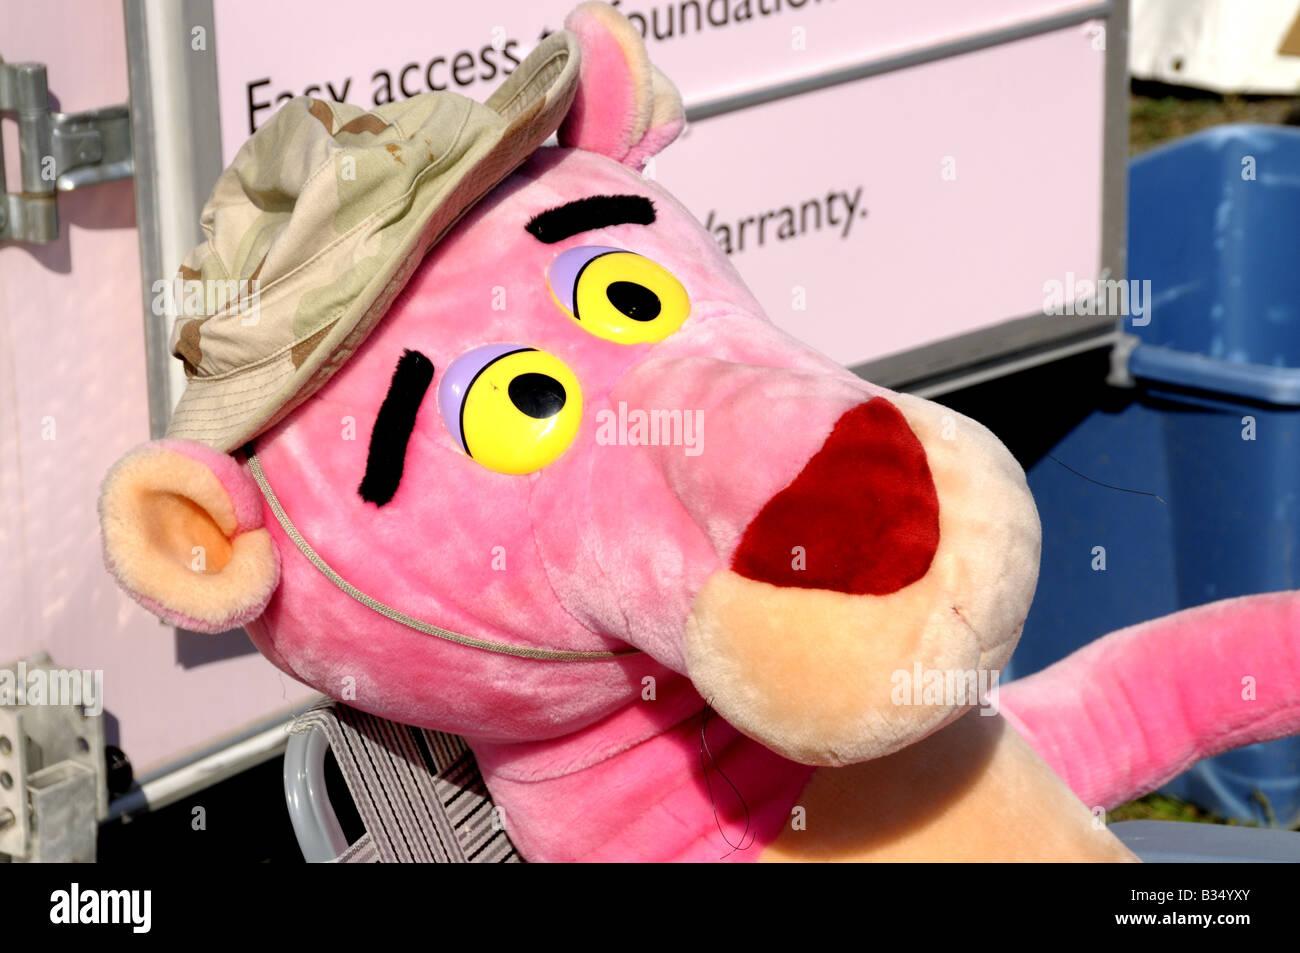 Cartoni animati Pantera rosa a riposo al County Fair di Gaithersburg, Maryland Immagini Stock